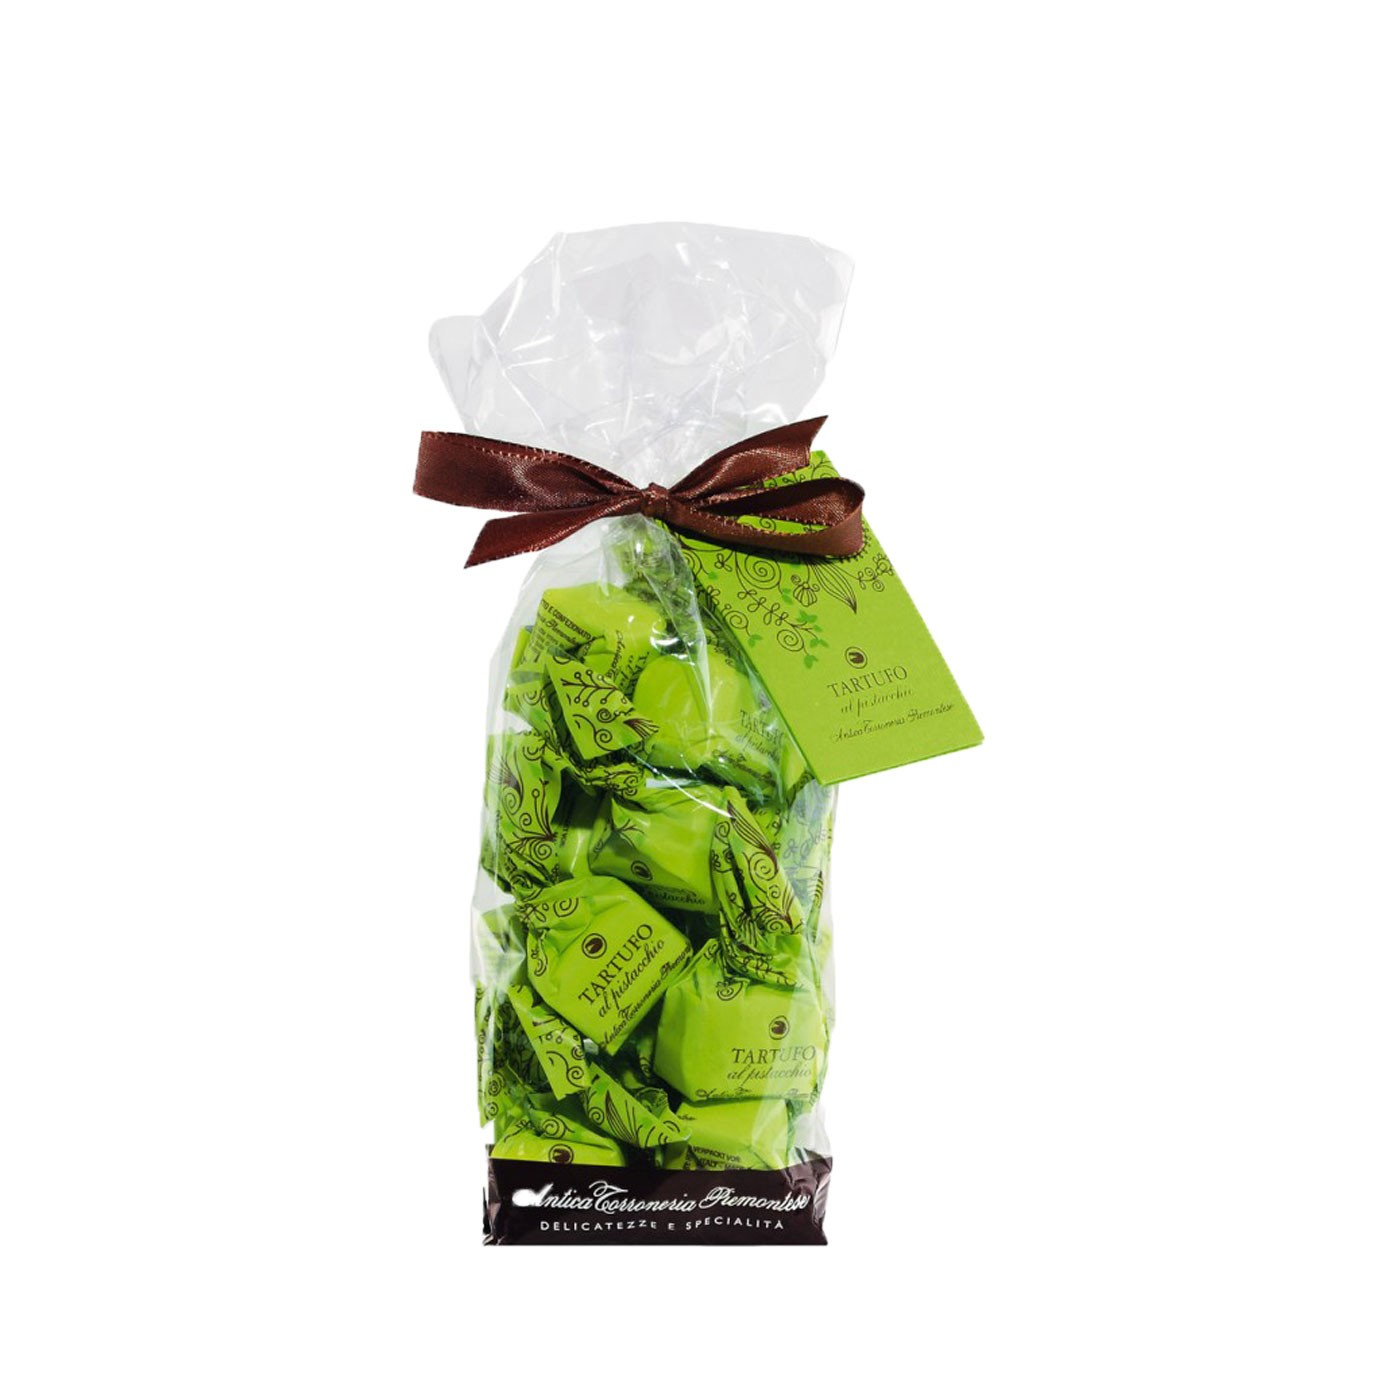 Sweet Chocolate and Pistachio Truffles 7 oz